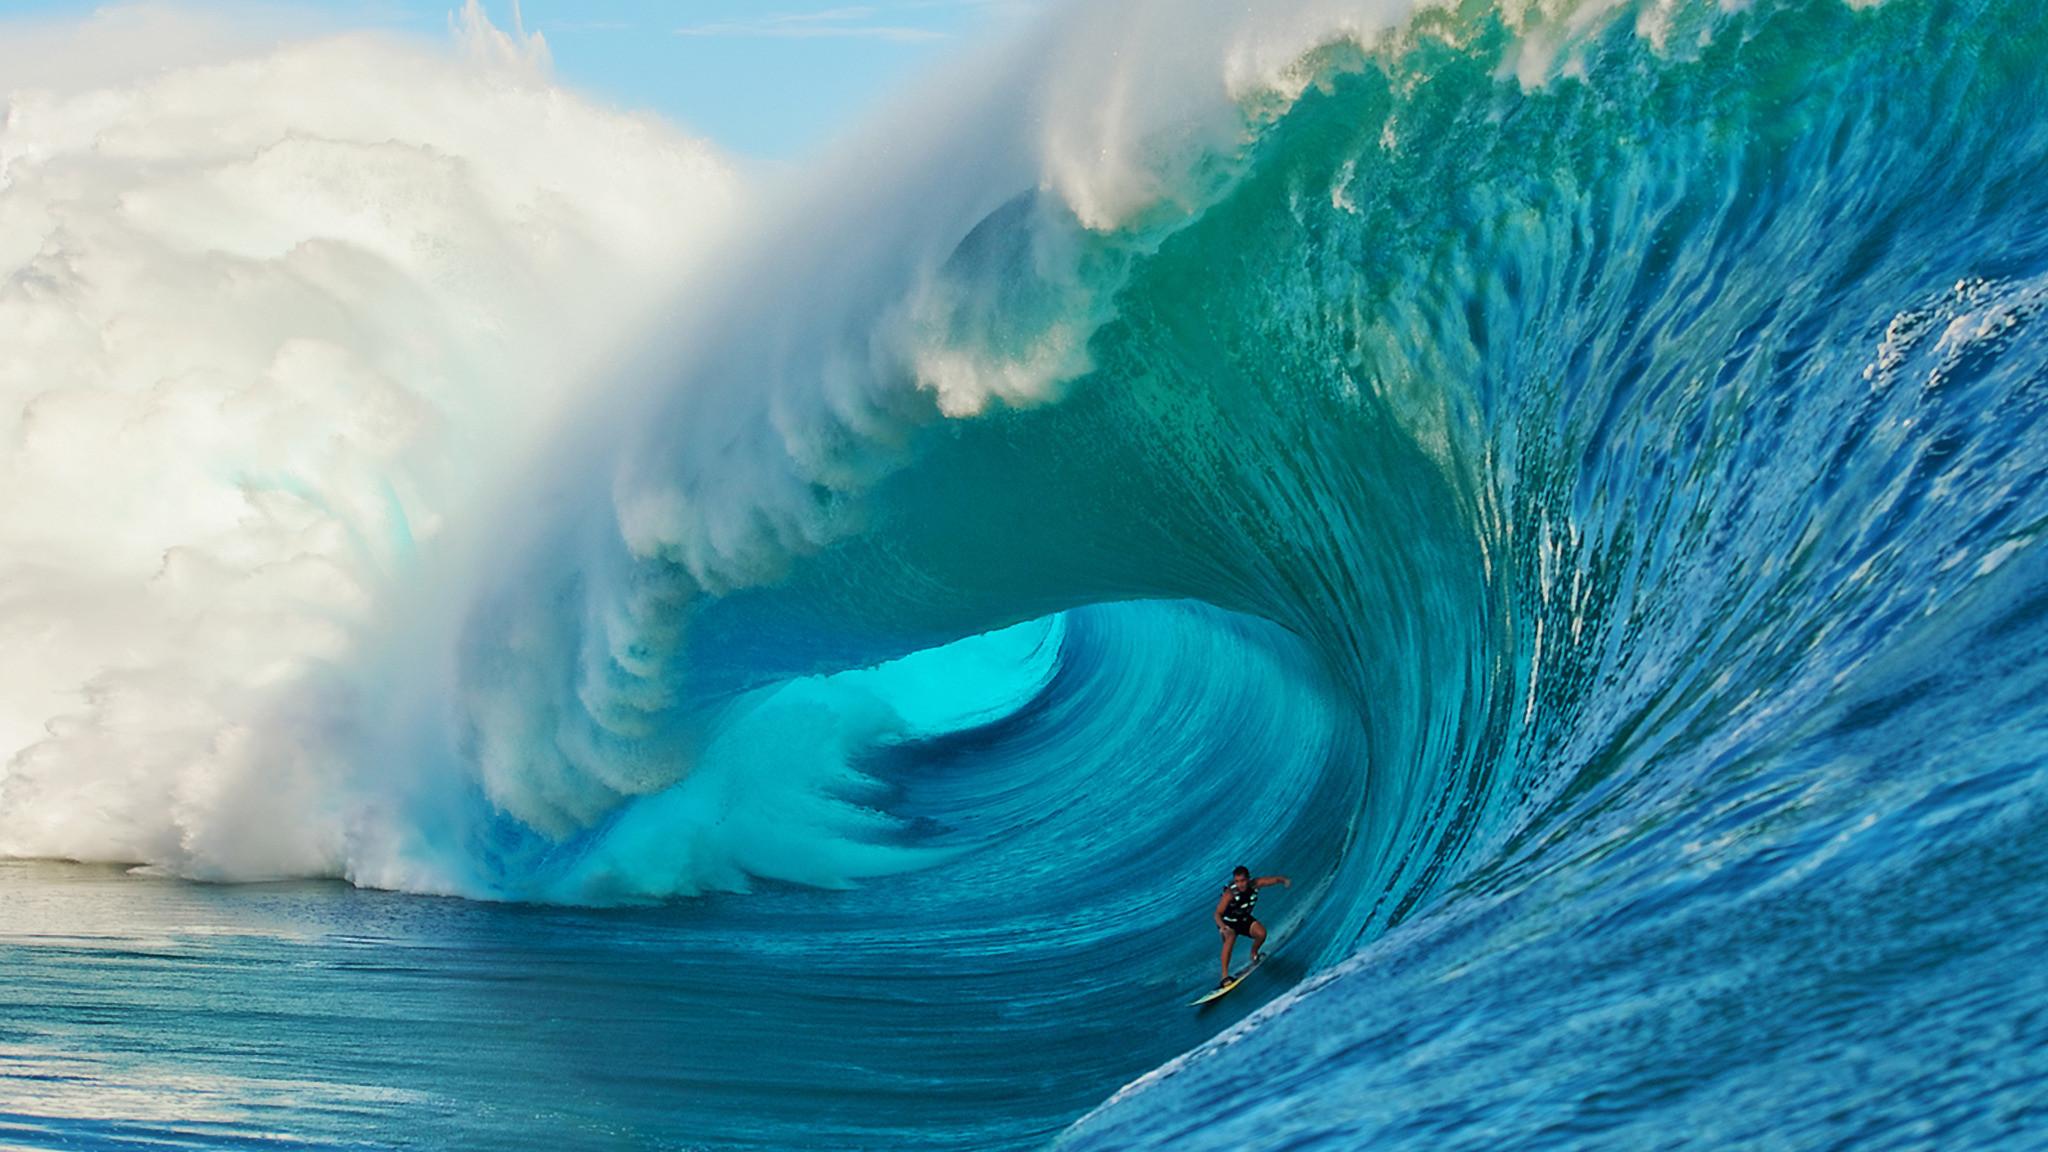 maverick waves   Mavericks Surf HD Wallpaper   FAVORITE CAREERS